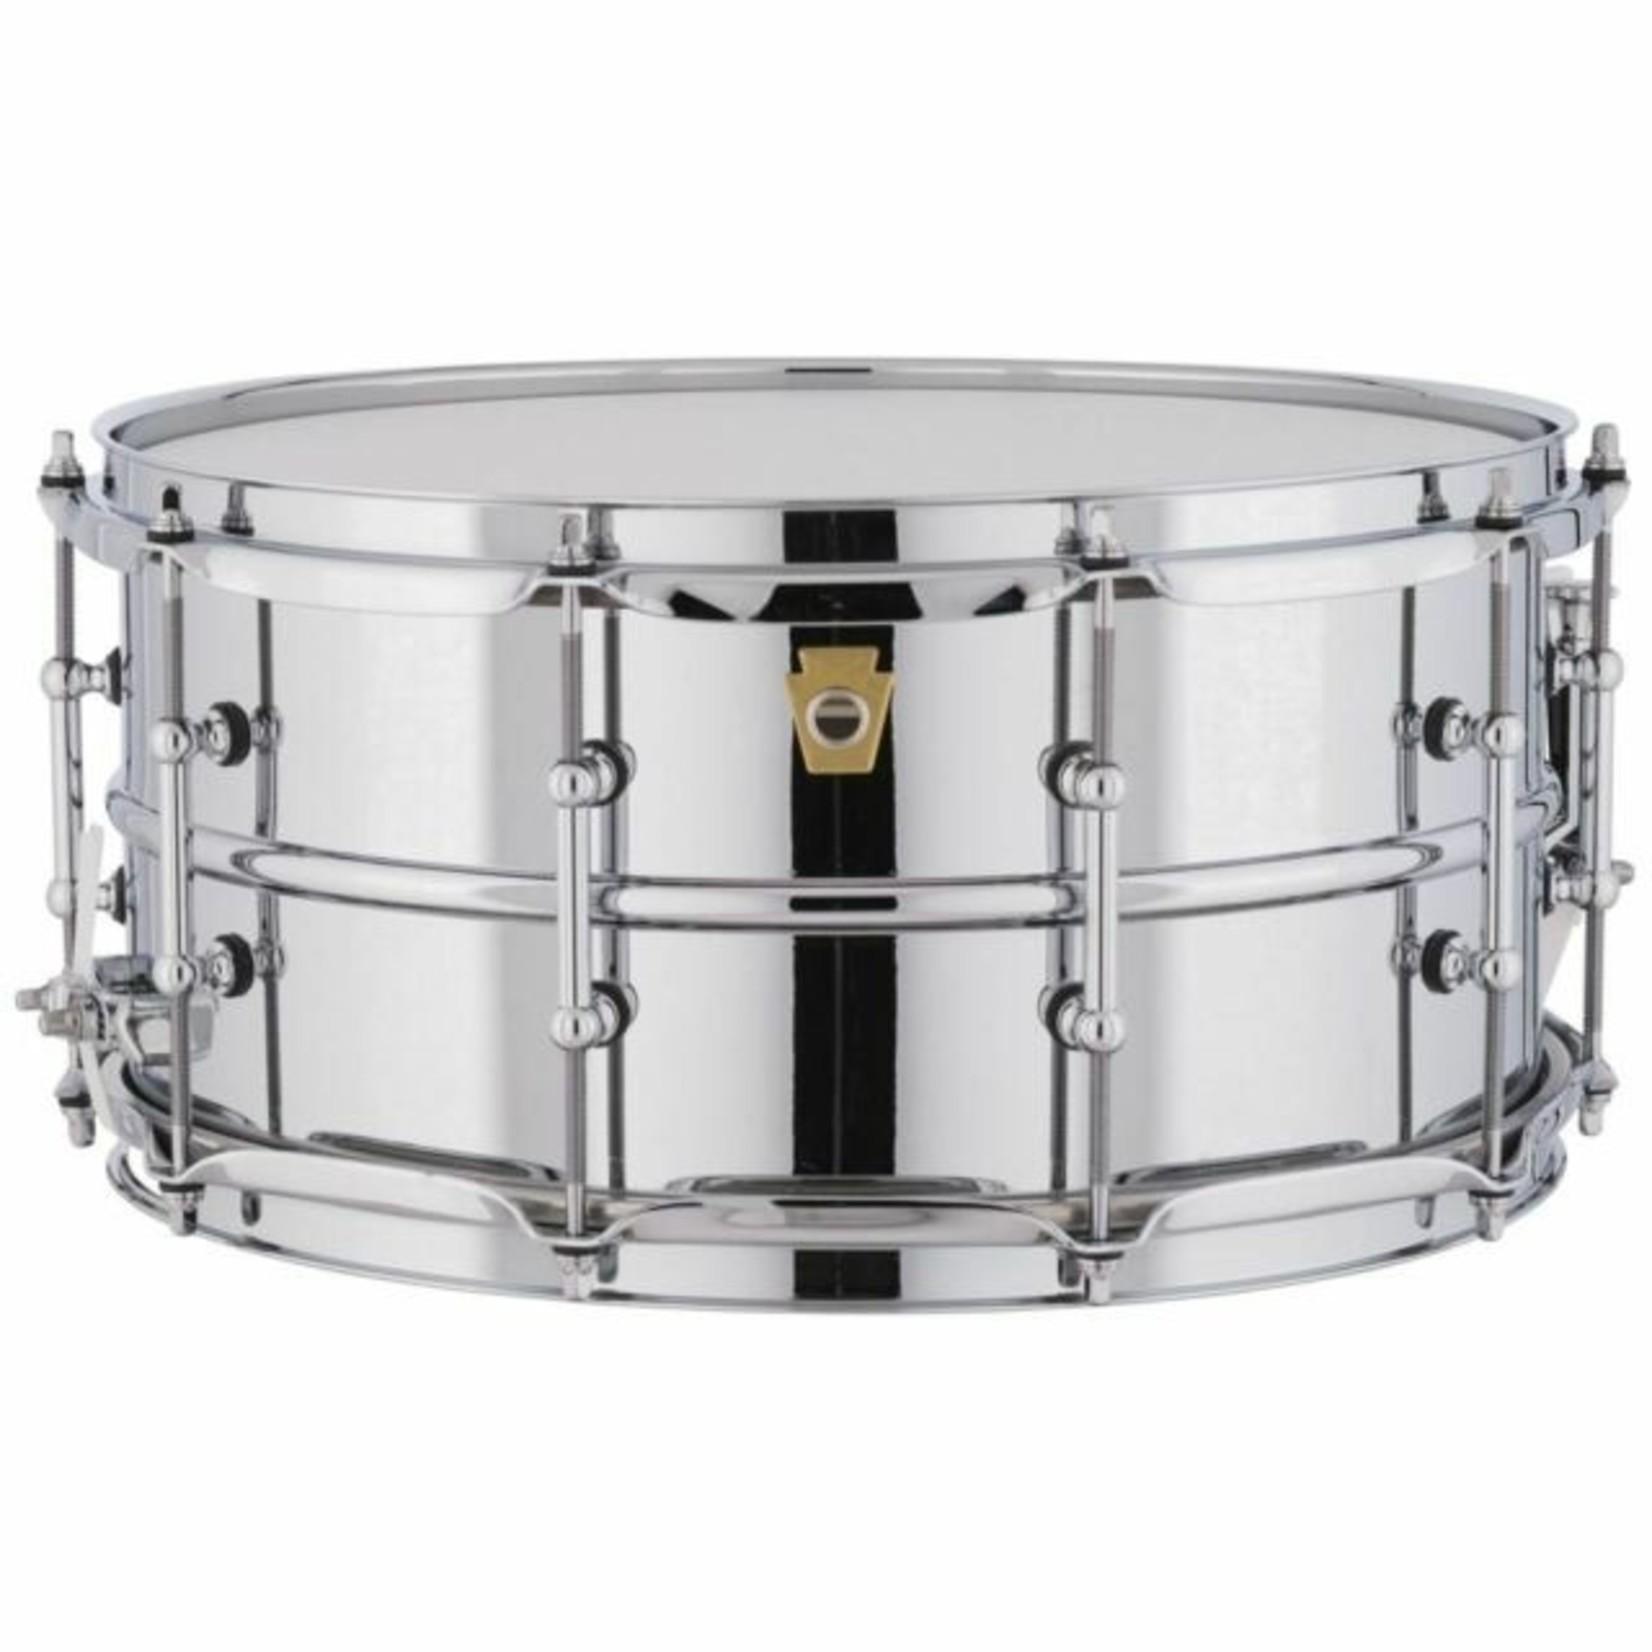 Ludwig Ludwig 6.5x14 Supraphonic Snare Drum / Tube Lugs / Smooth Shell